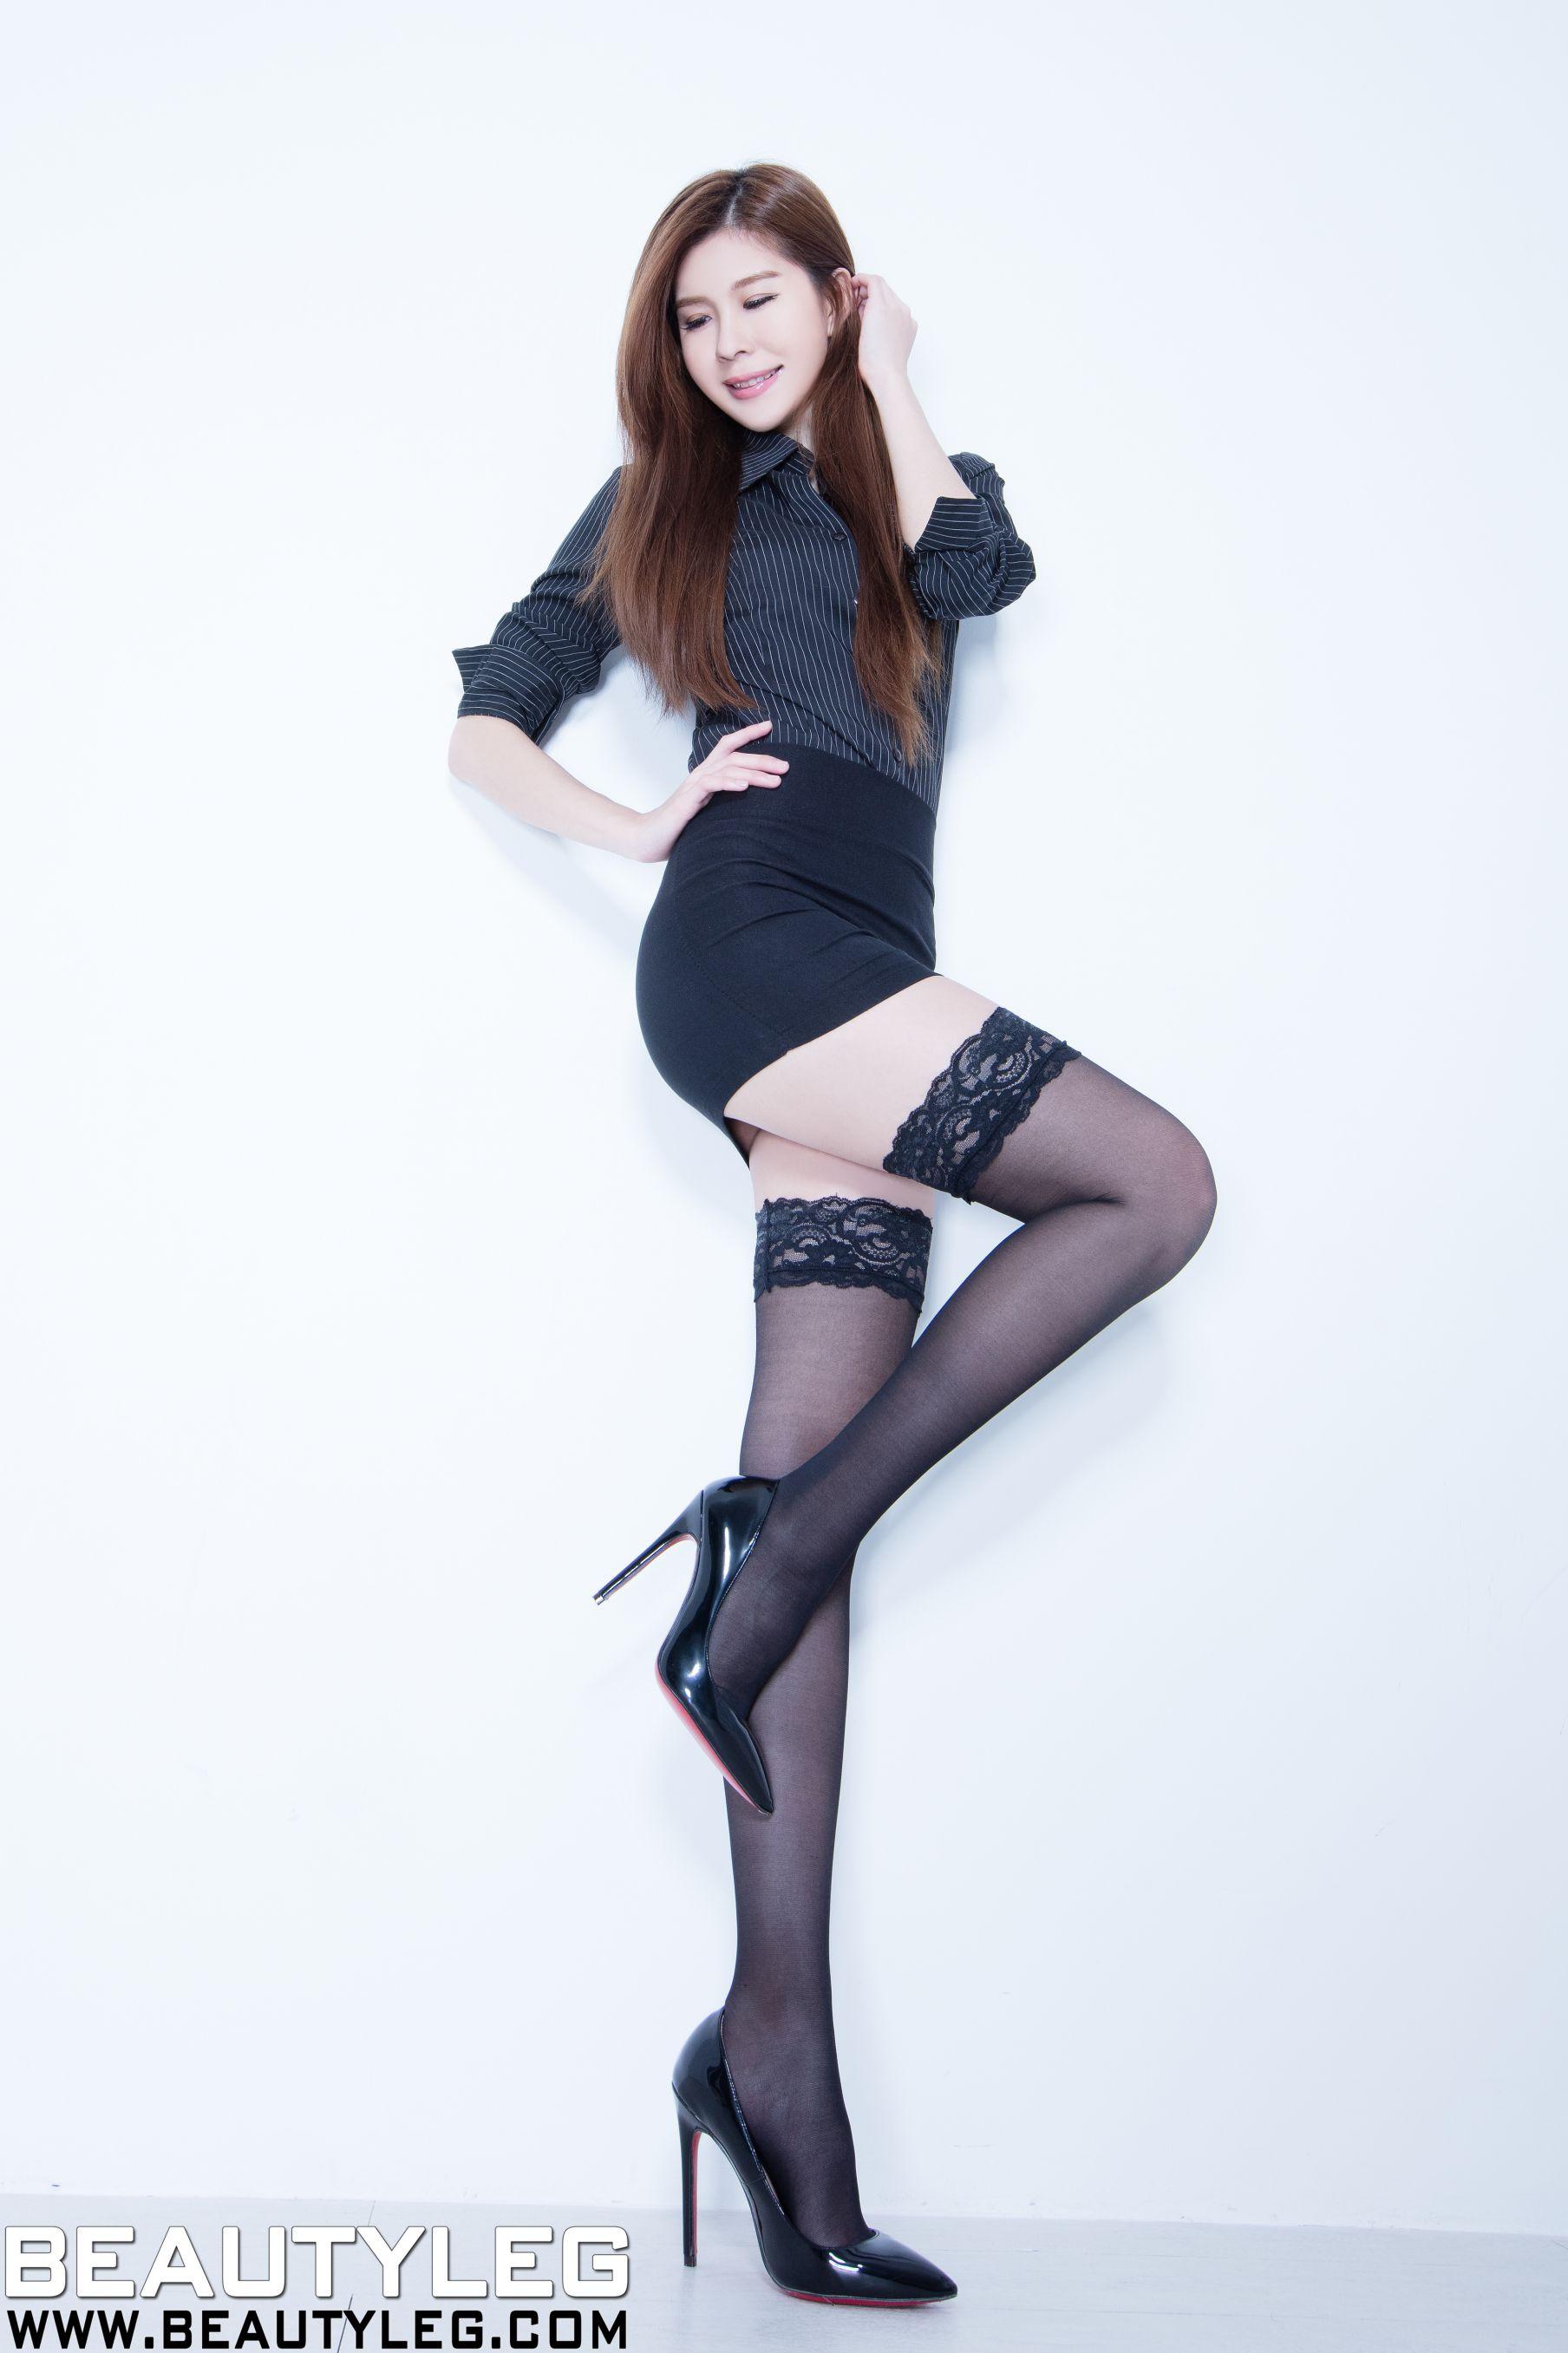 VOL.881 [Beautyleg]长筒袜丝袜美腿:腿模Sarah高品质写真套图(44P)